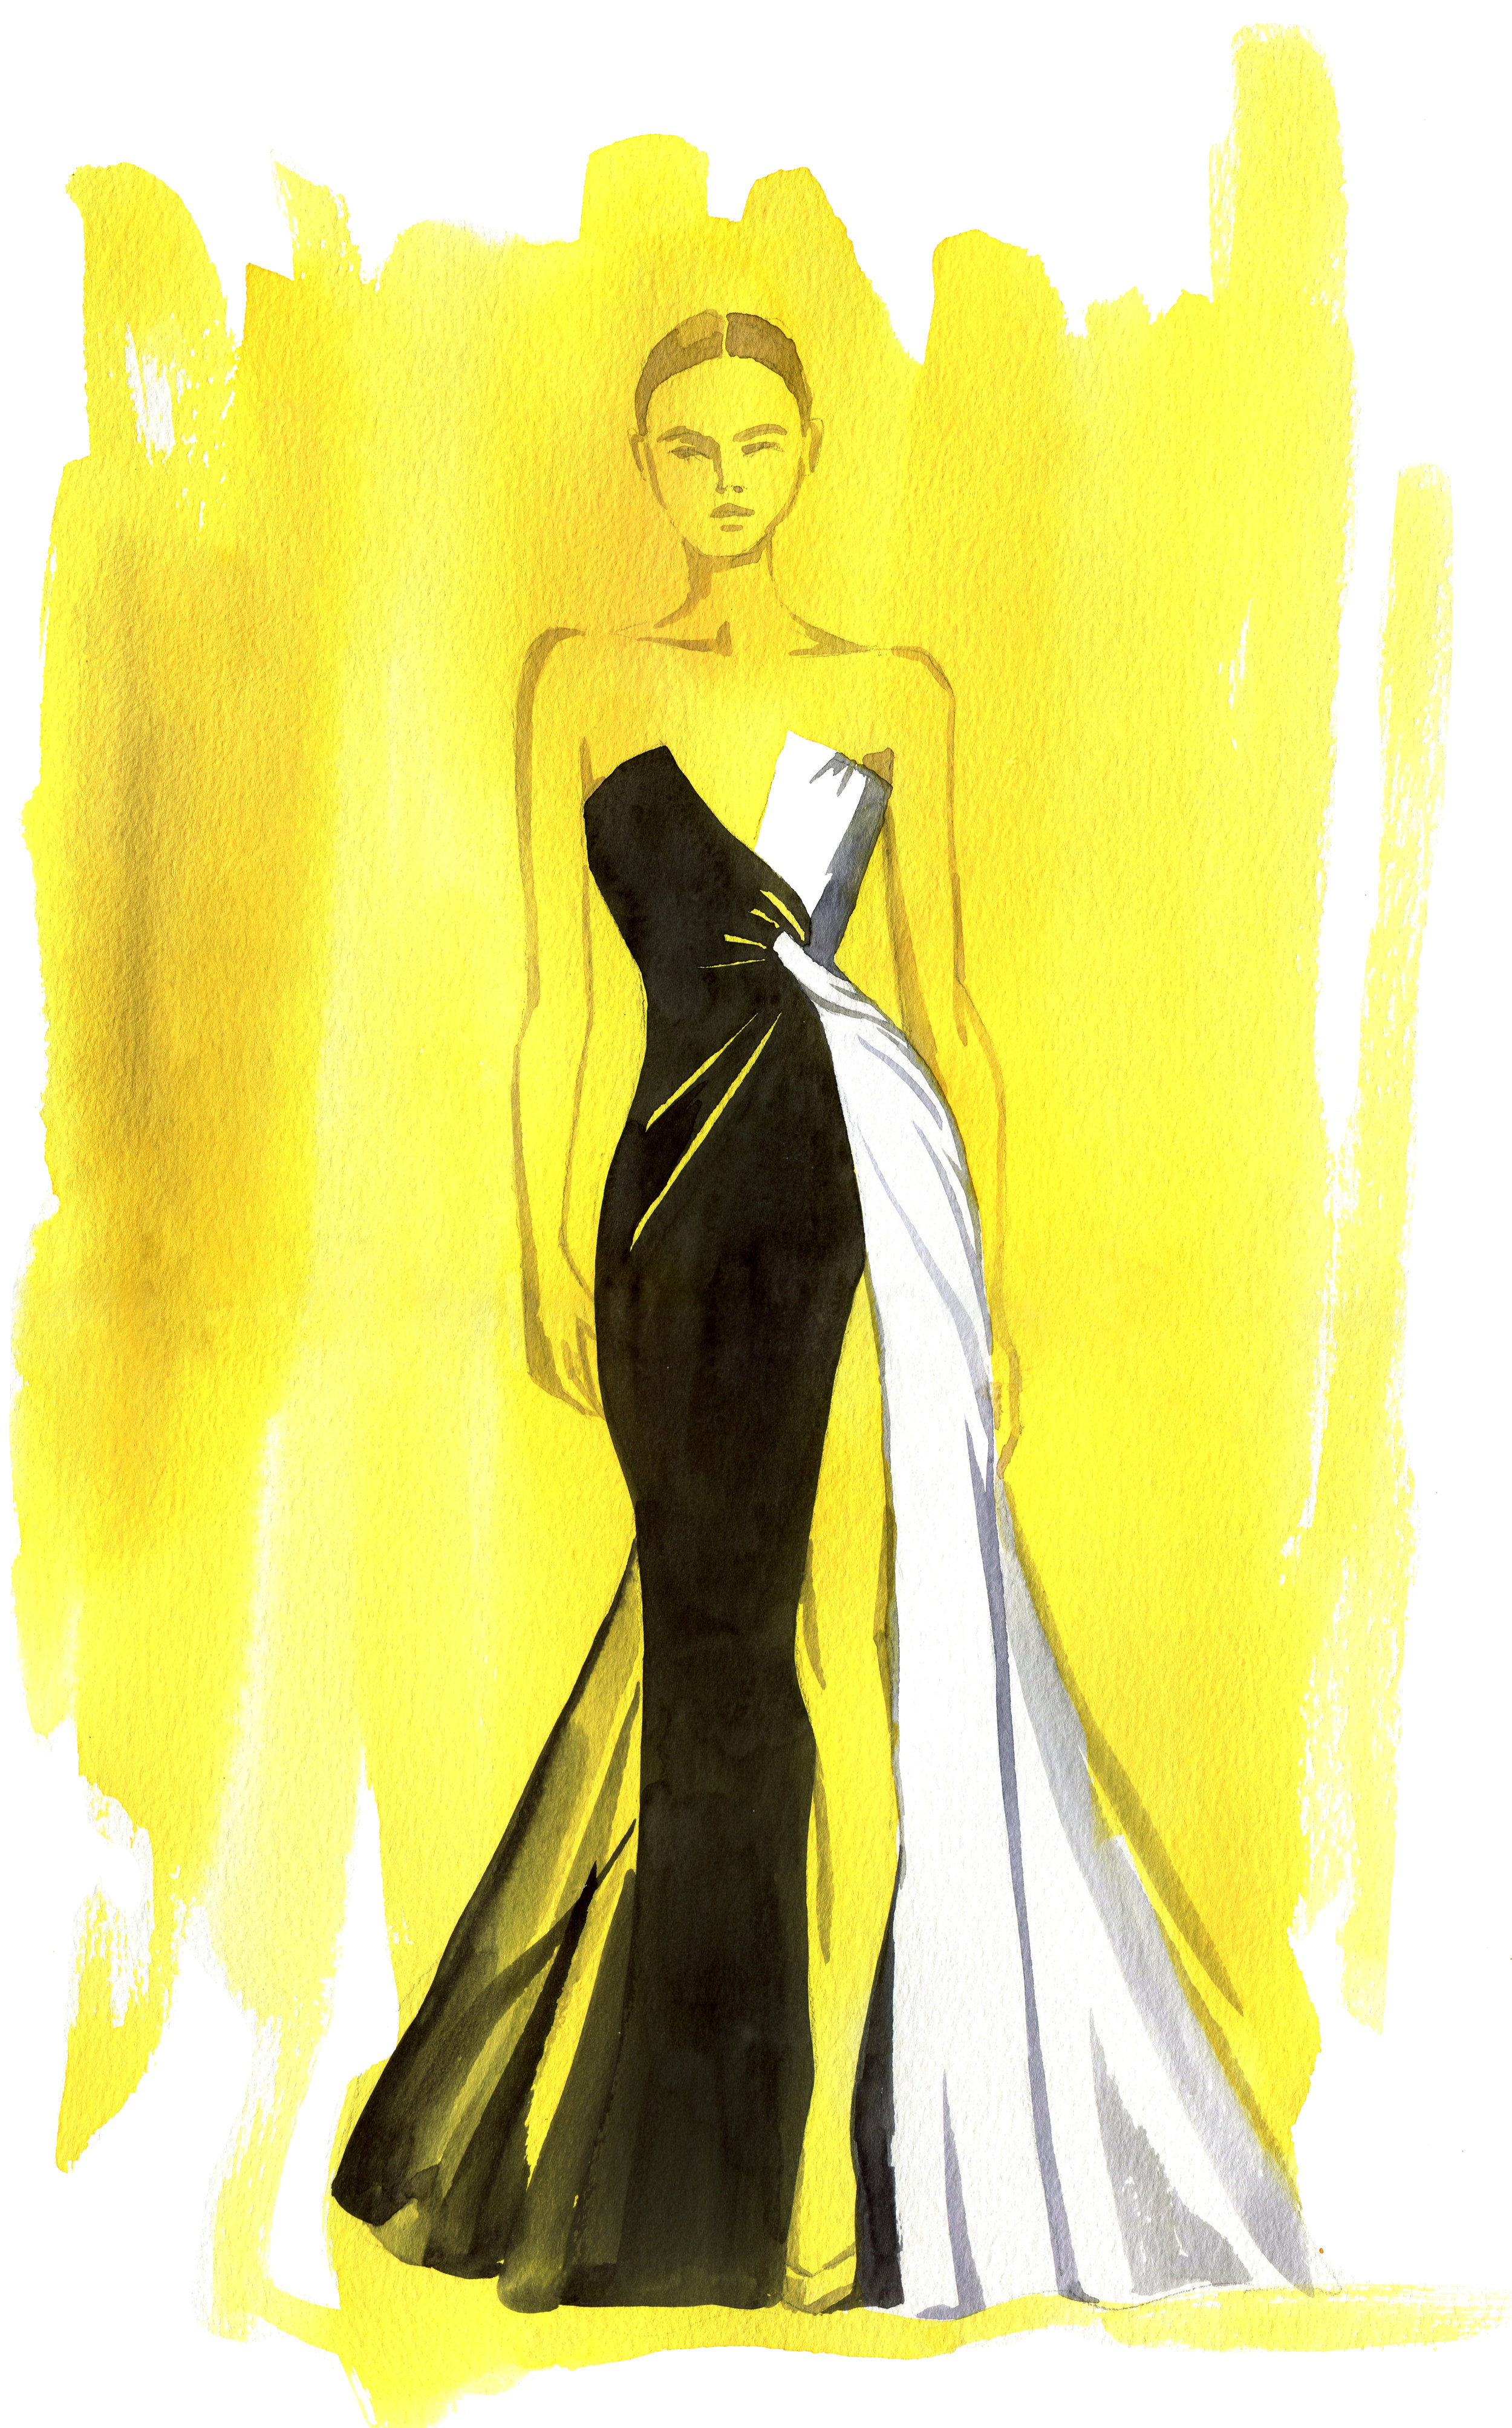 figure_yellow.jpg